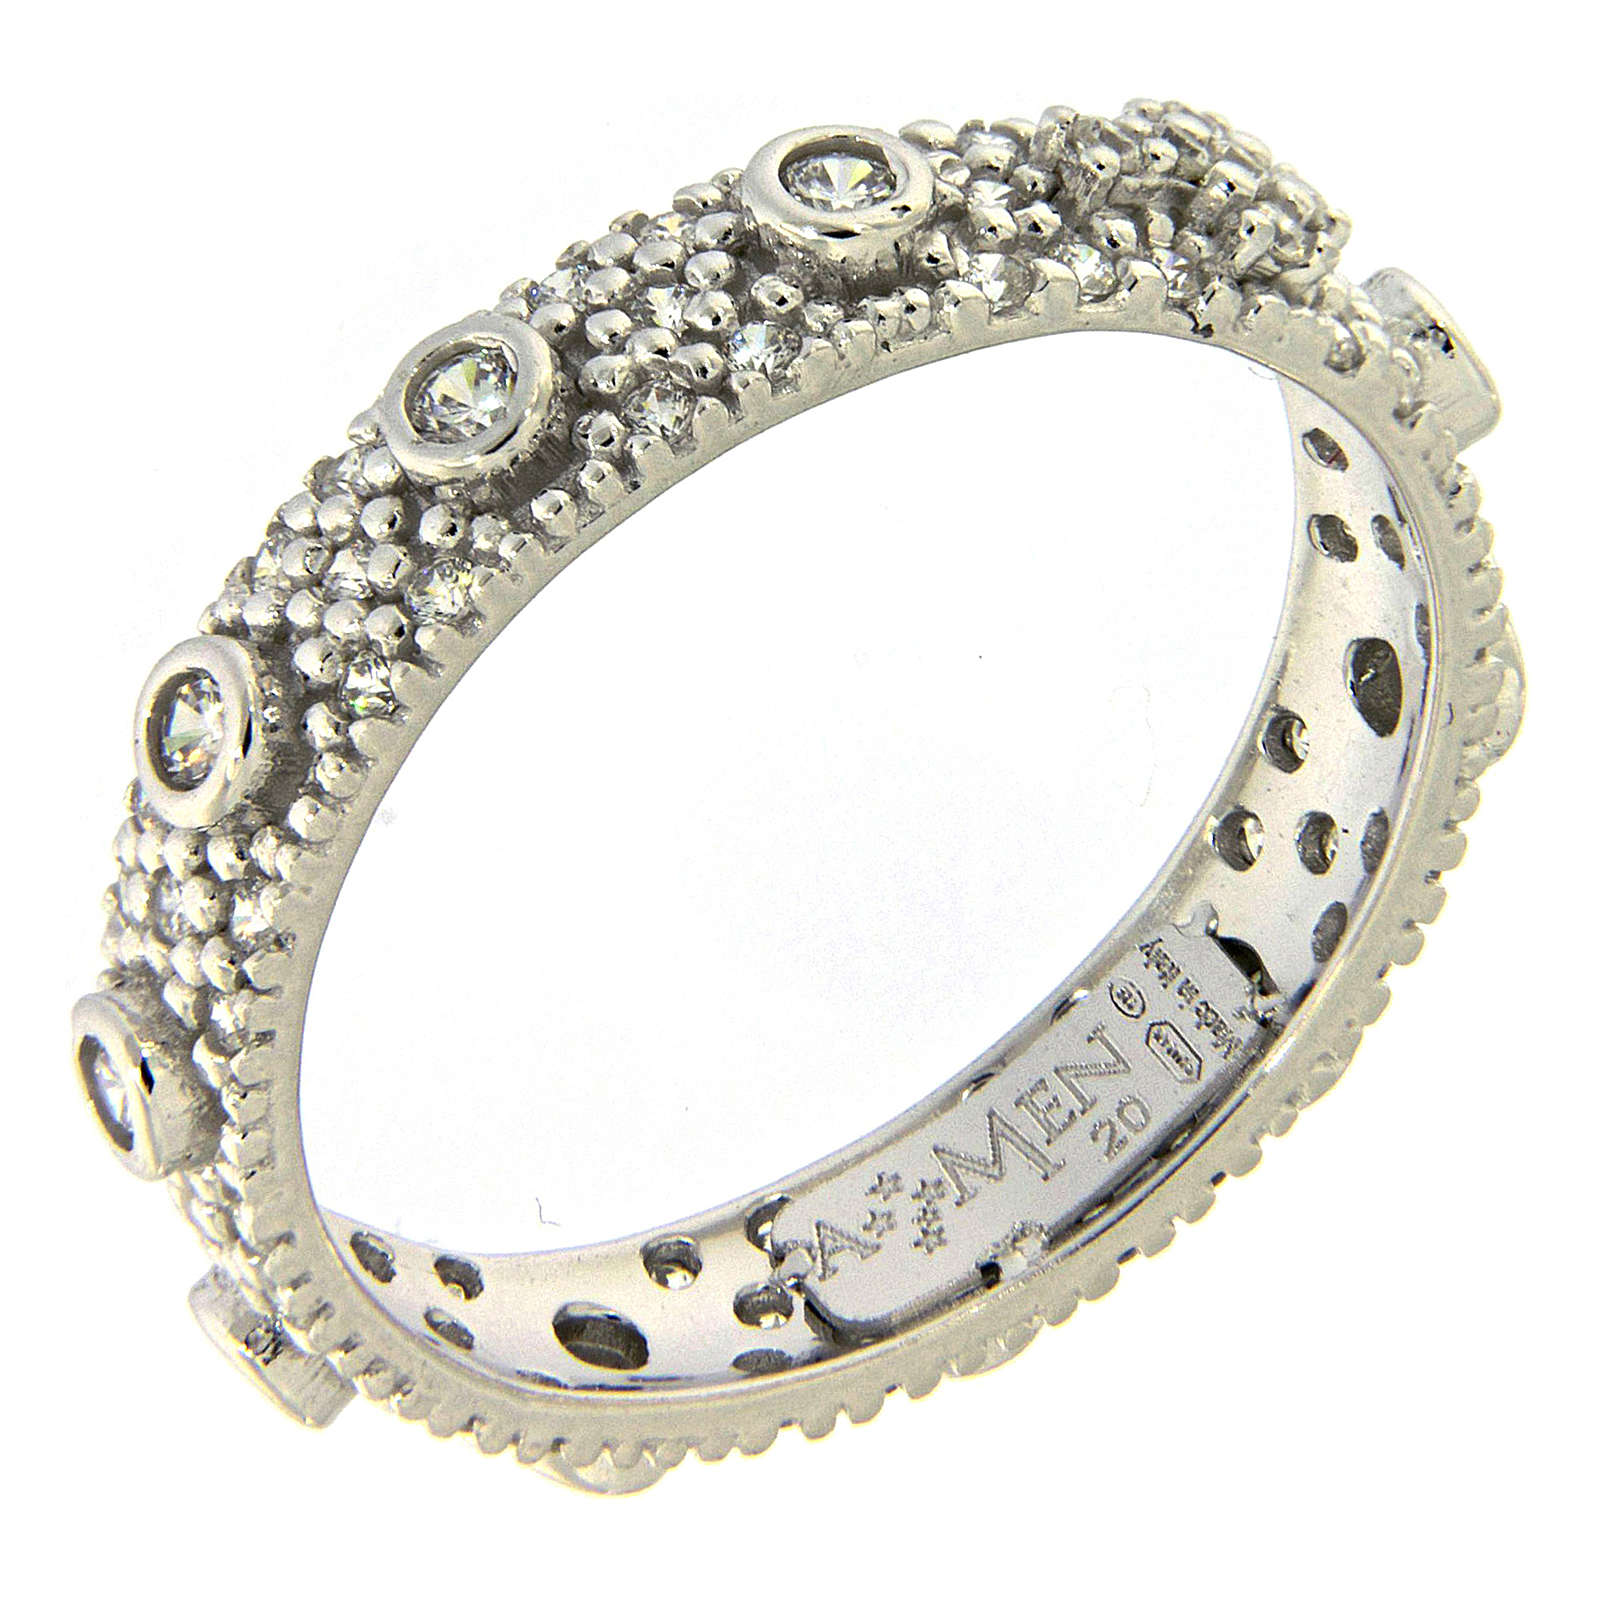 Ten-Beads AMEN rhodium-plated silver 925, white zircons 3